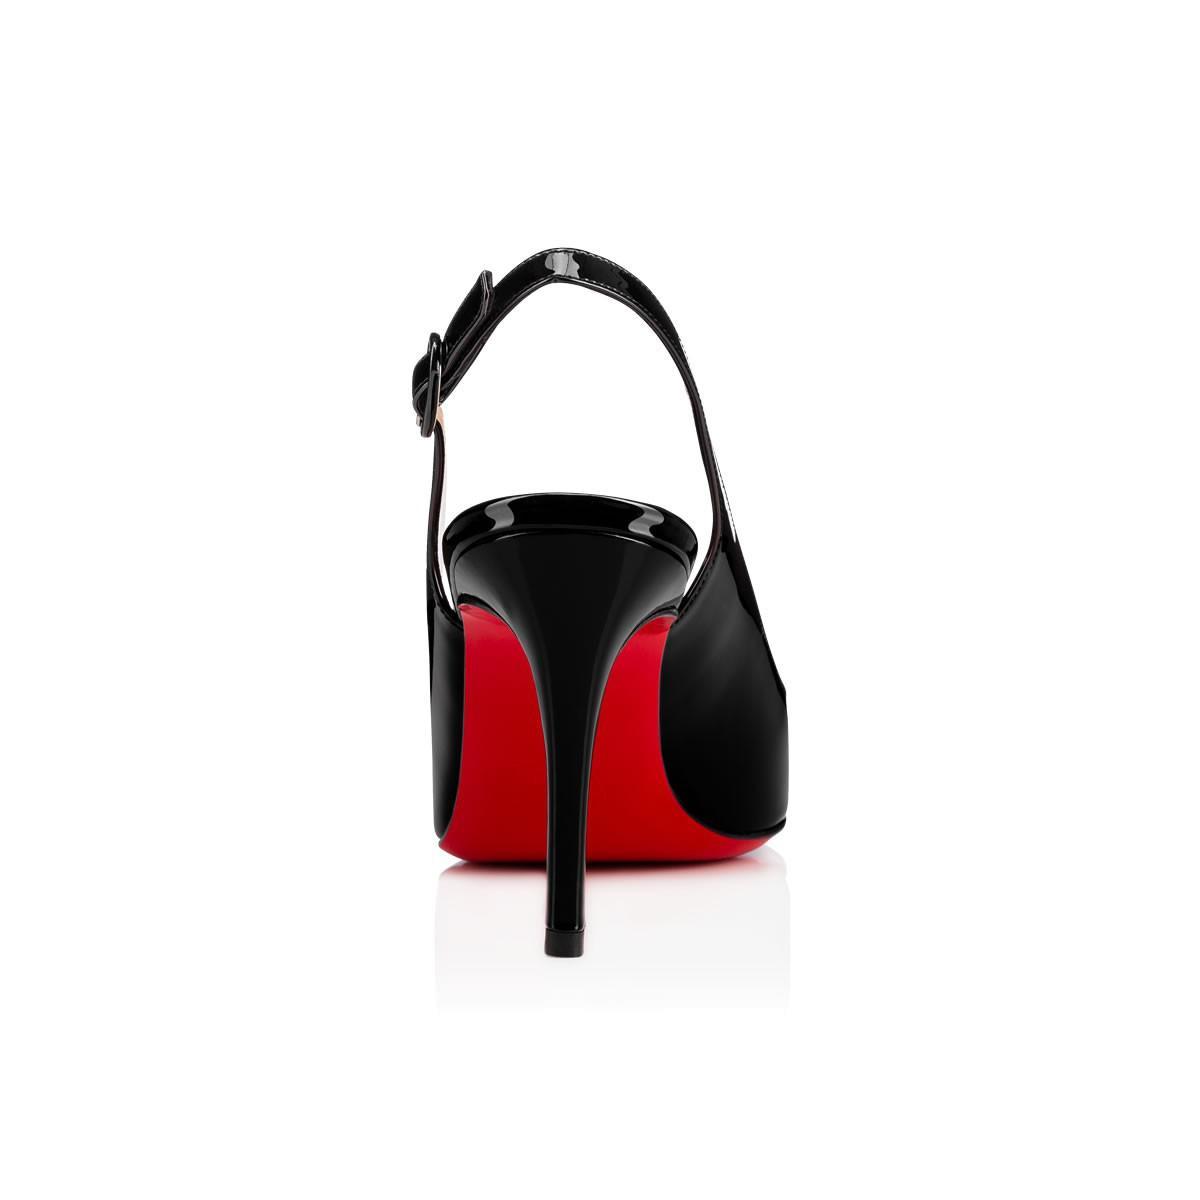 8381694bc36e Lyst - Christian Louboutin Miss Gena Sling Patent 85 Black Patent ...